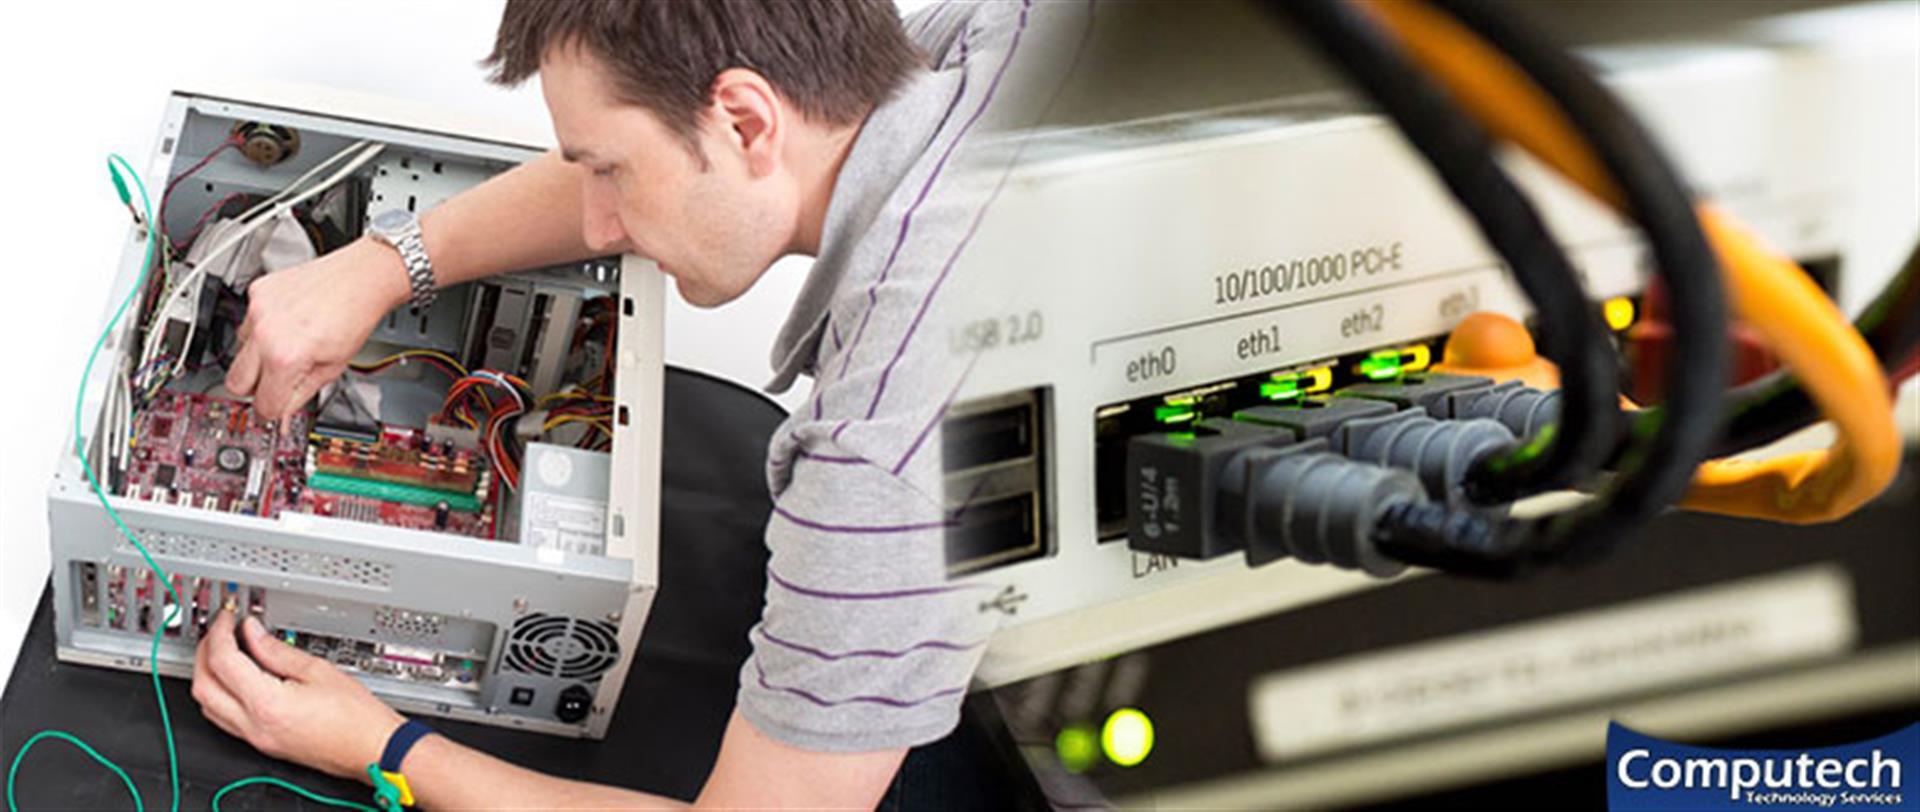 Elkton Virginia Onsite Computer PC & Printer Repair, Networking, Voice & Data Cabling Solutions